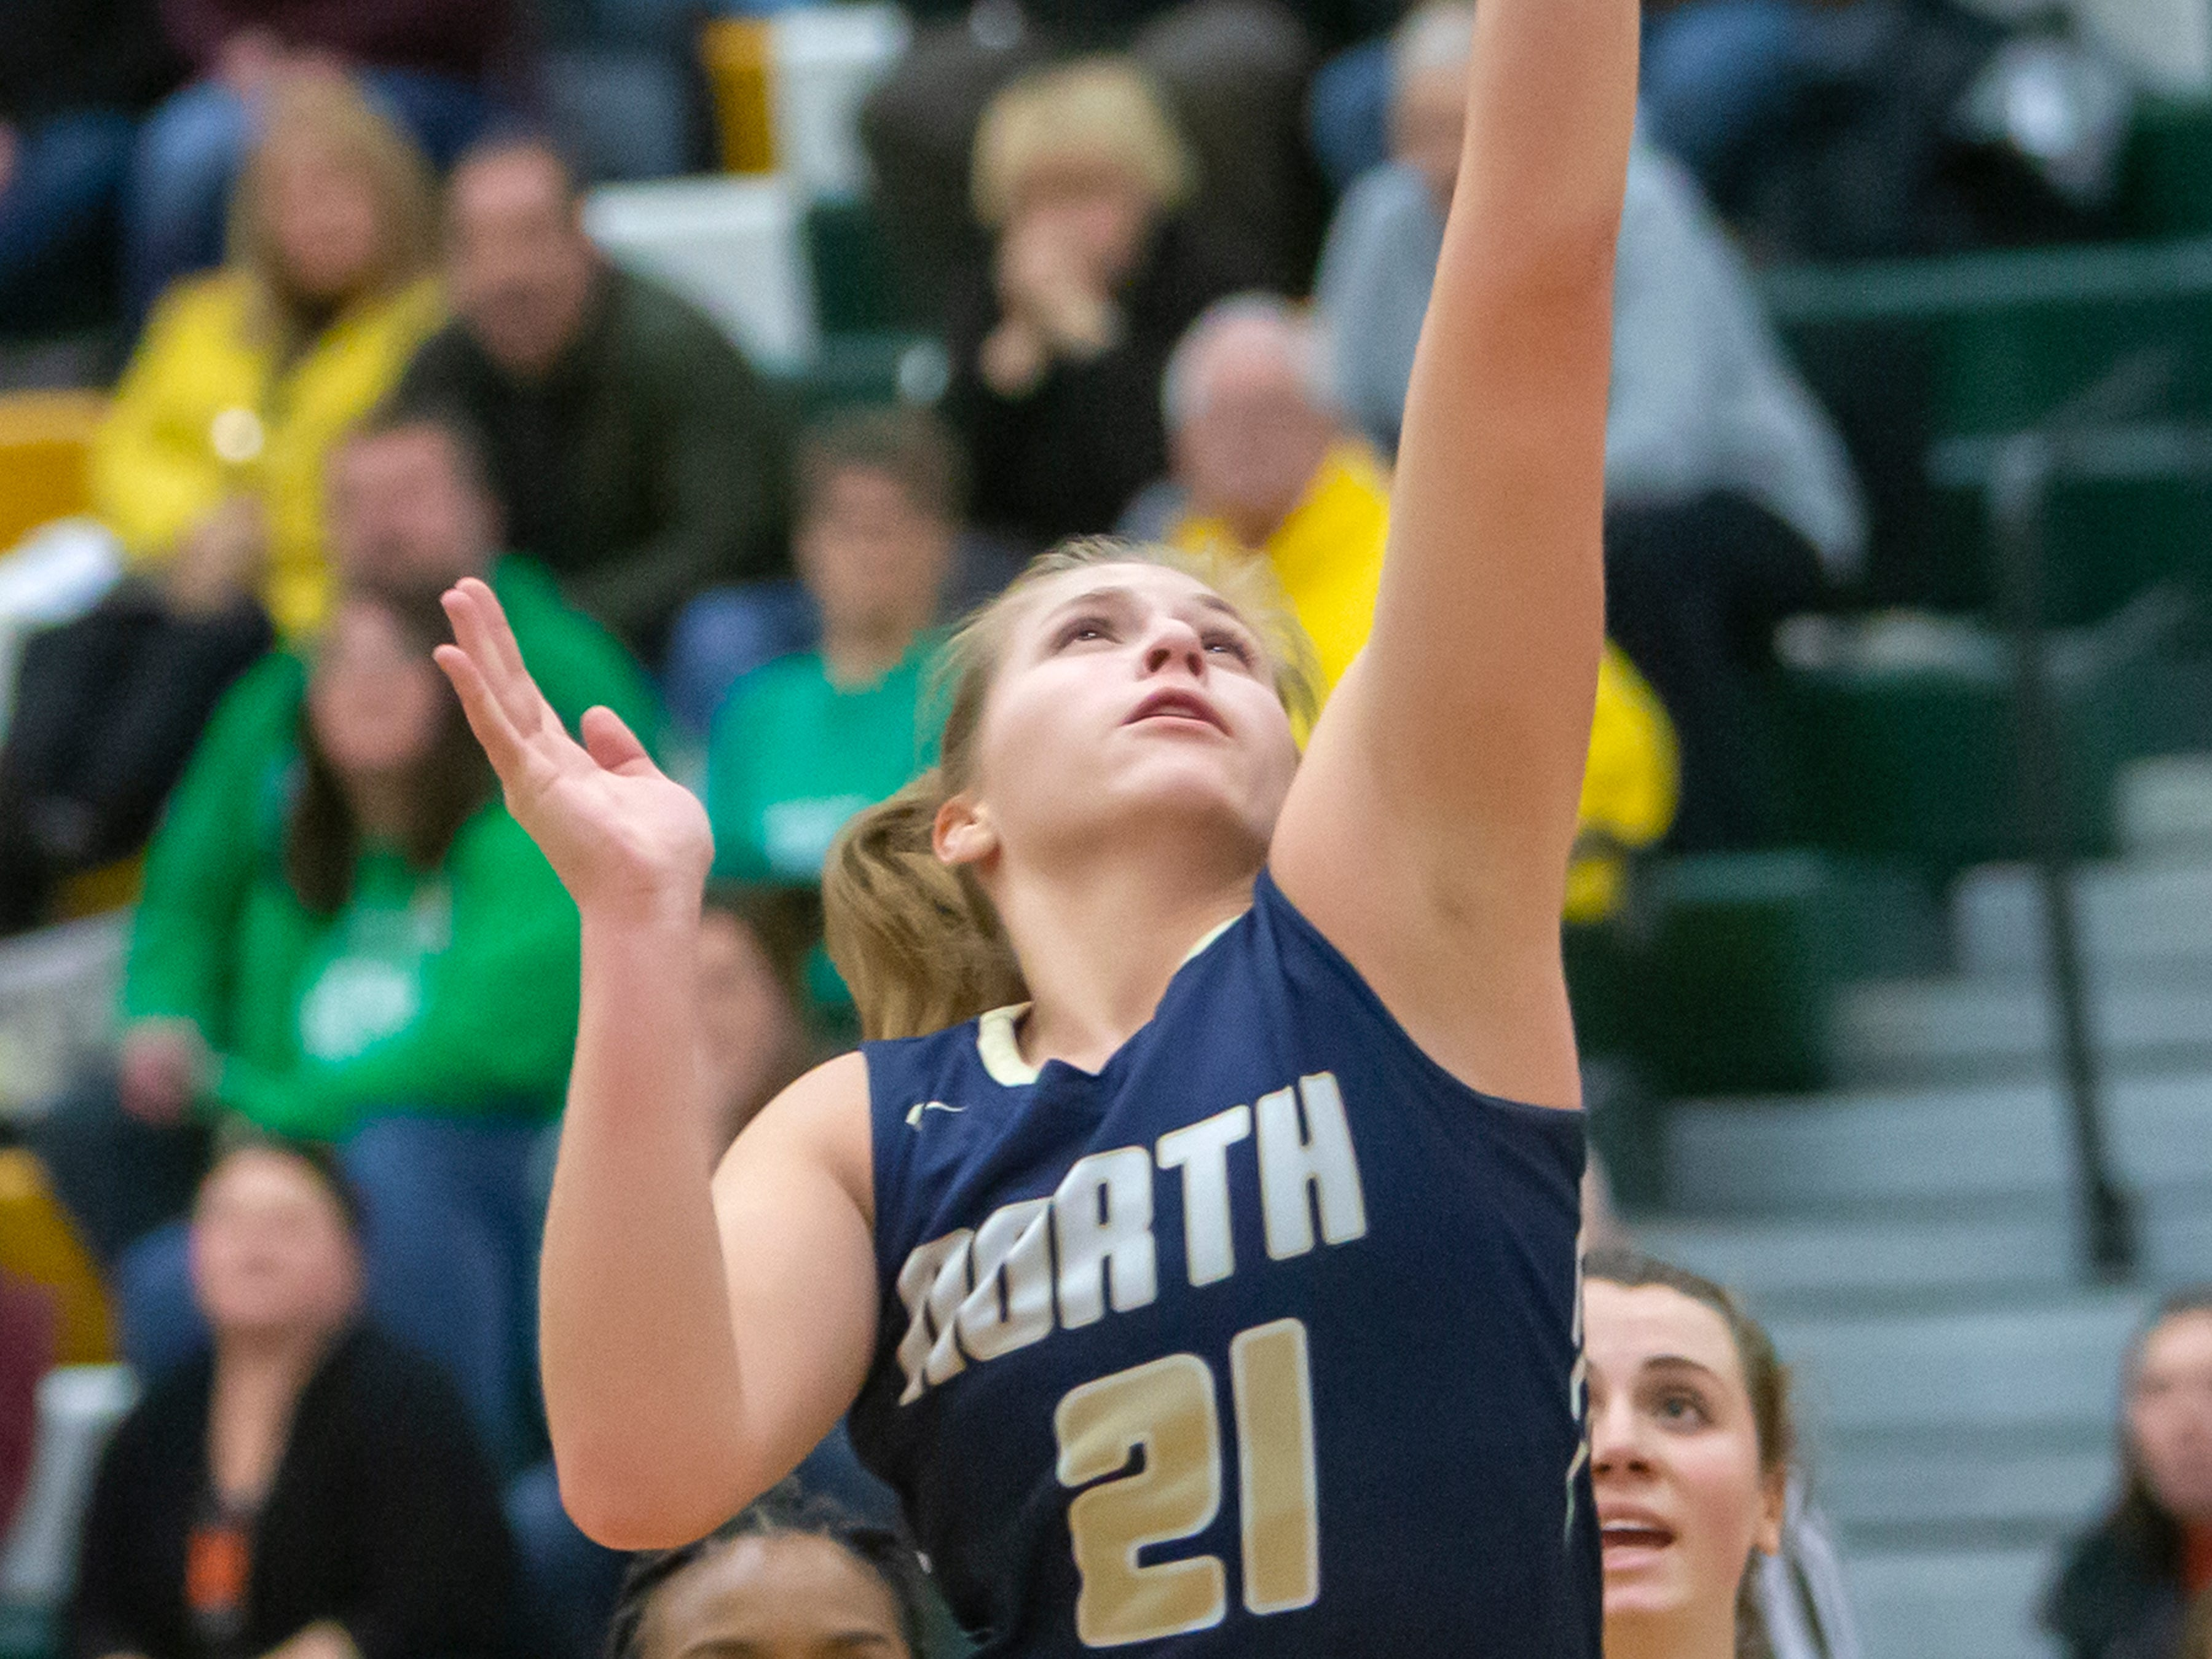 Appleton North's Lilli Van Handel shoots during the girls basketball game Friday against Oshkosh North, February 8, 2019, in Oshkosh, Wis., at Oshkosh North High School.